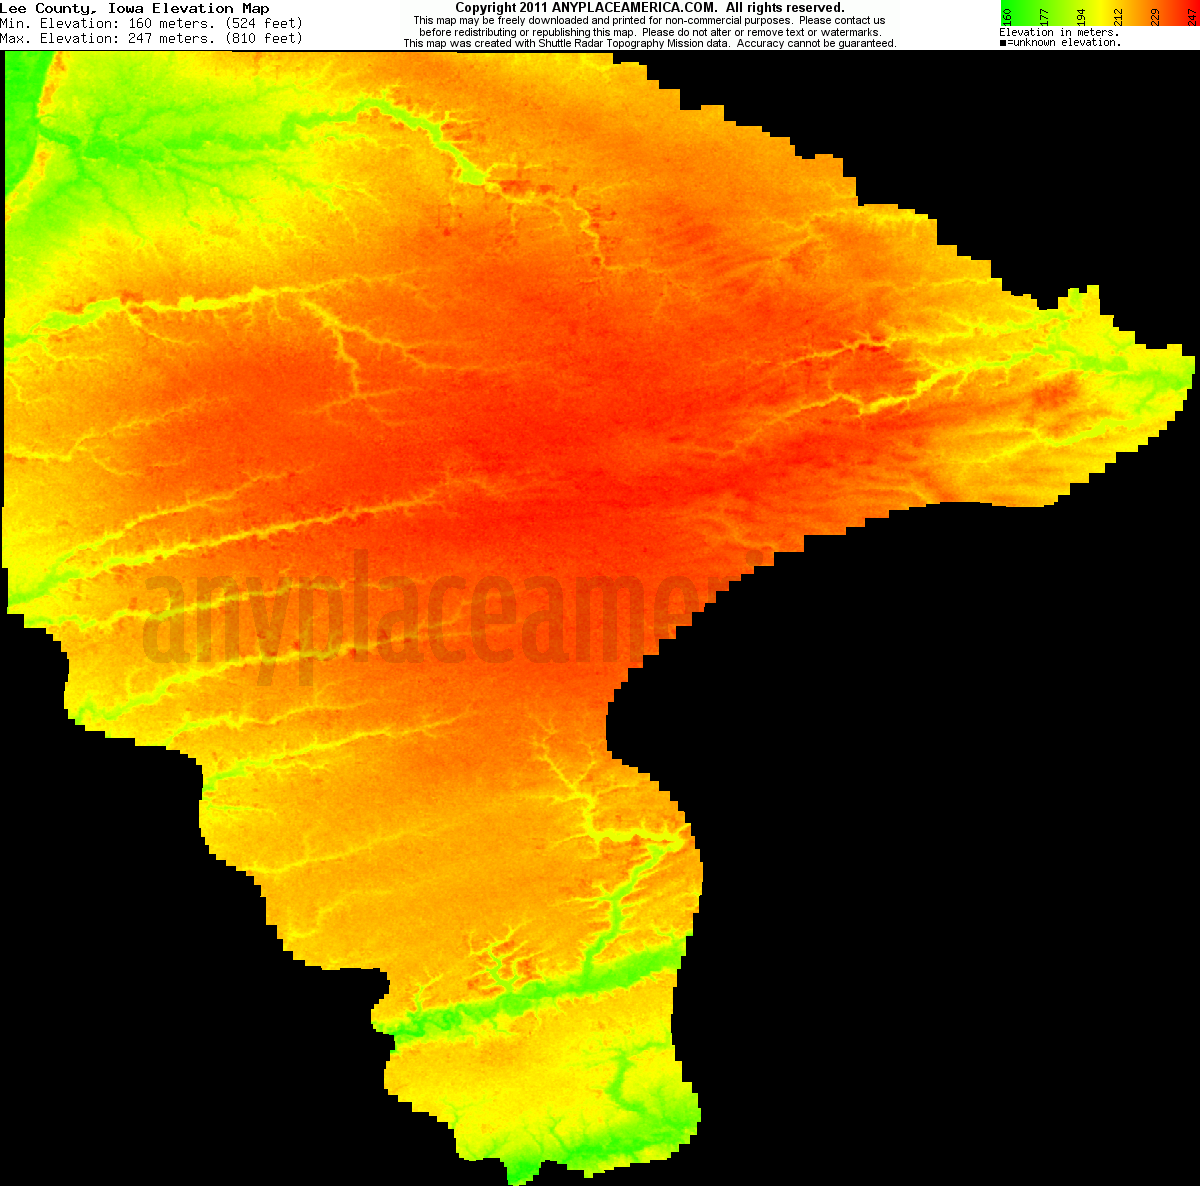 free lee county iowa topo maps elevations free lee county iowa topo maps